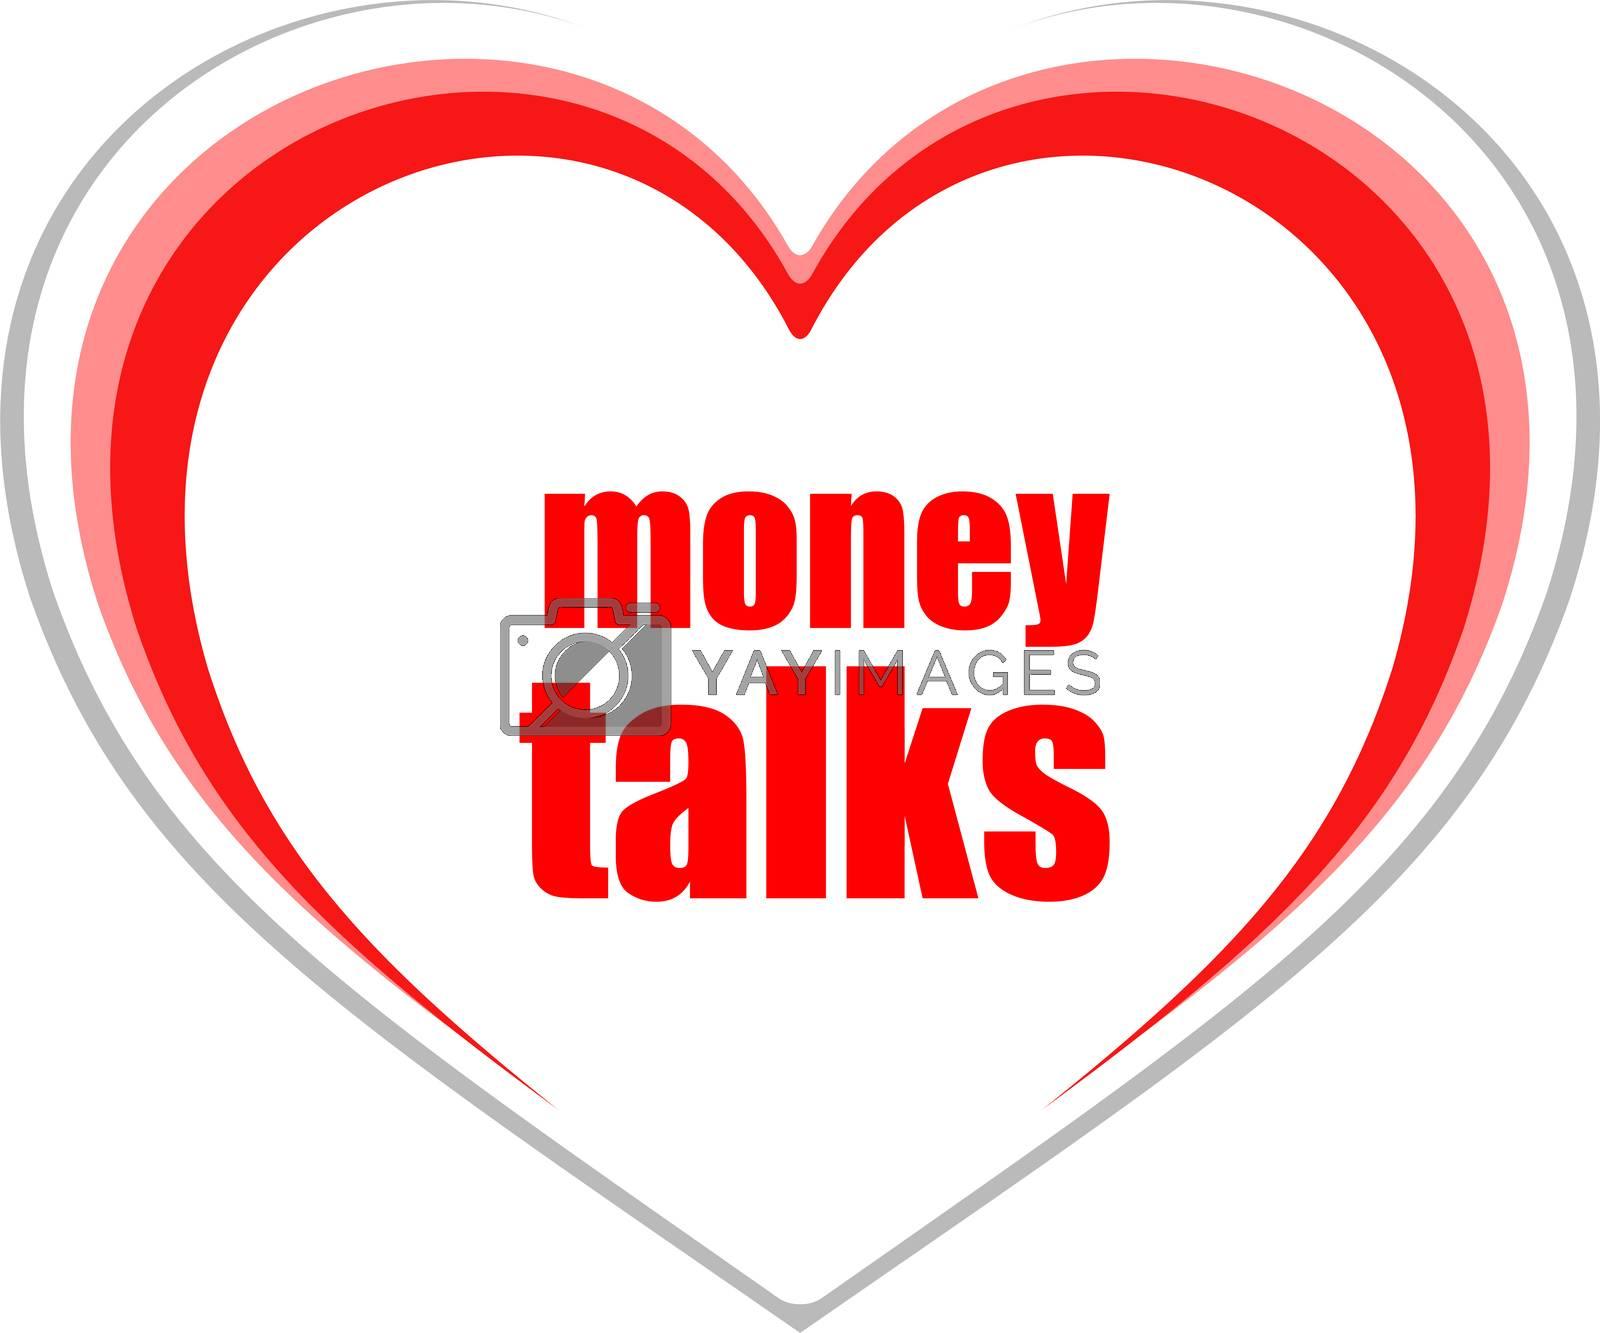 Text Money talks. Business concept